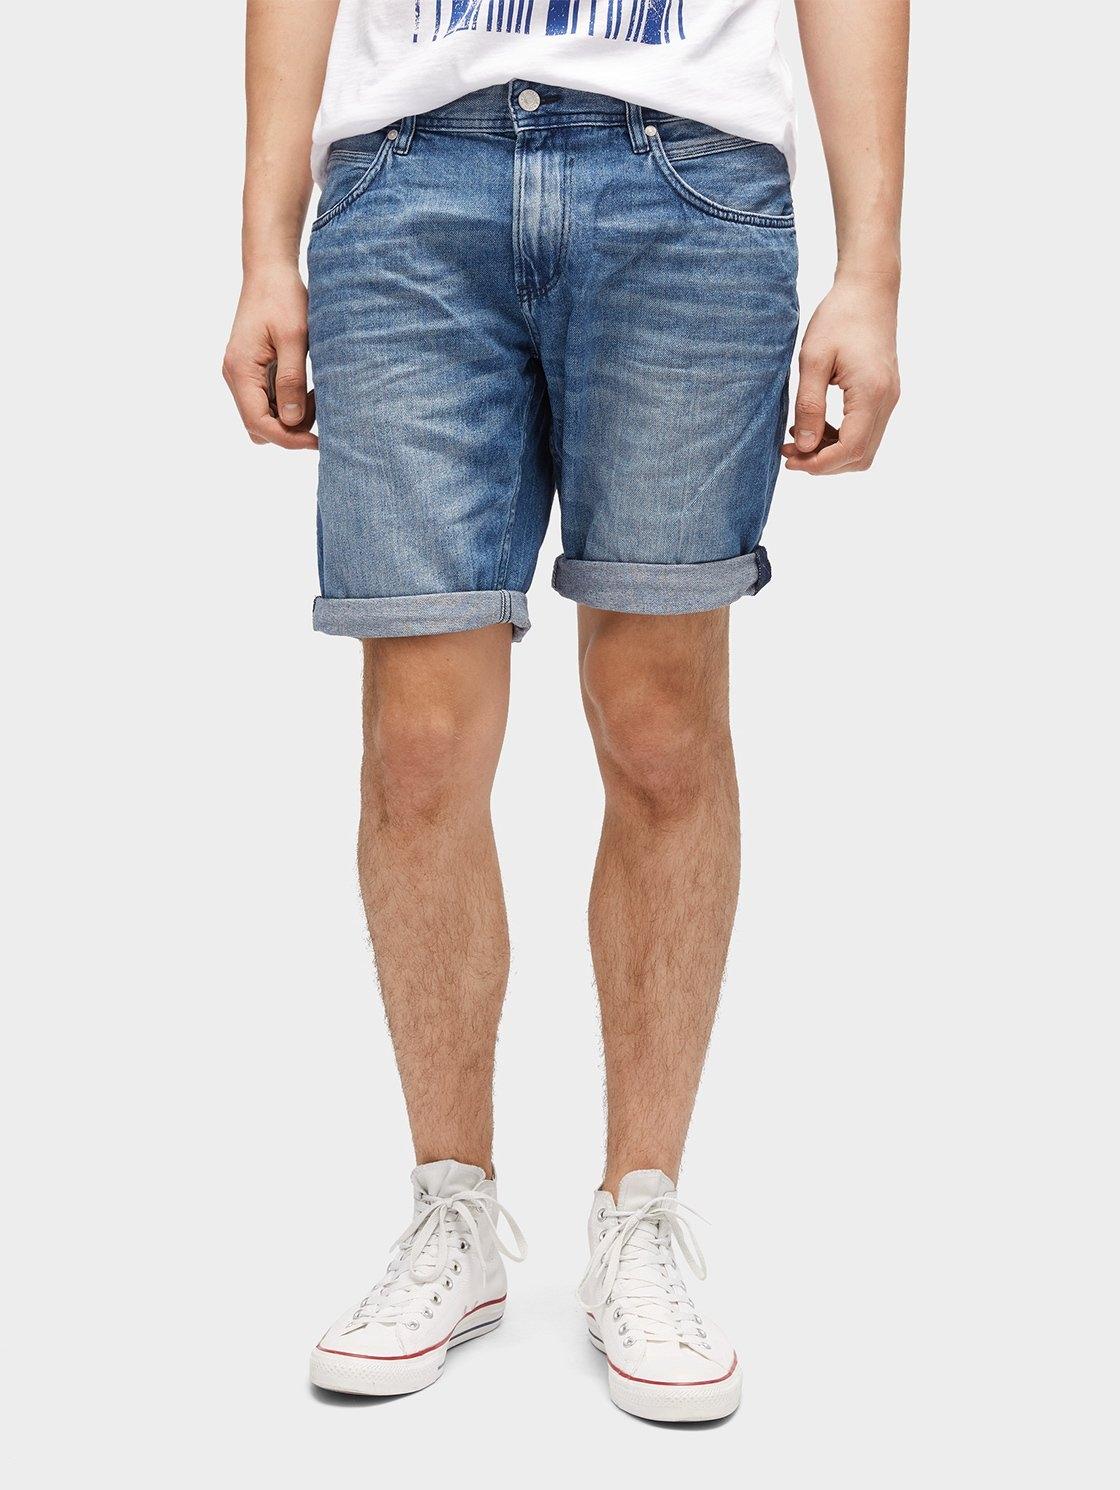 Tom Tailor Denim bermuda »Jeans Shorts«  Bestel nu bij   OTTO 9195179fe3